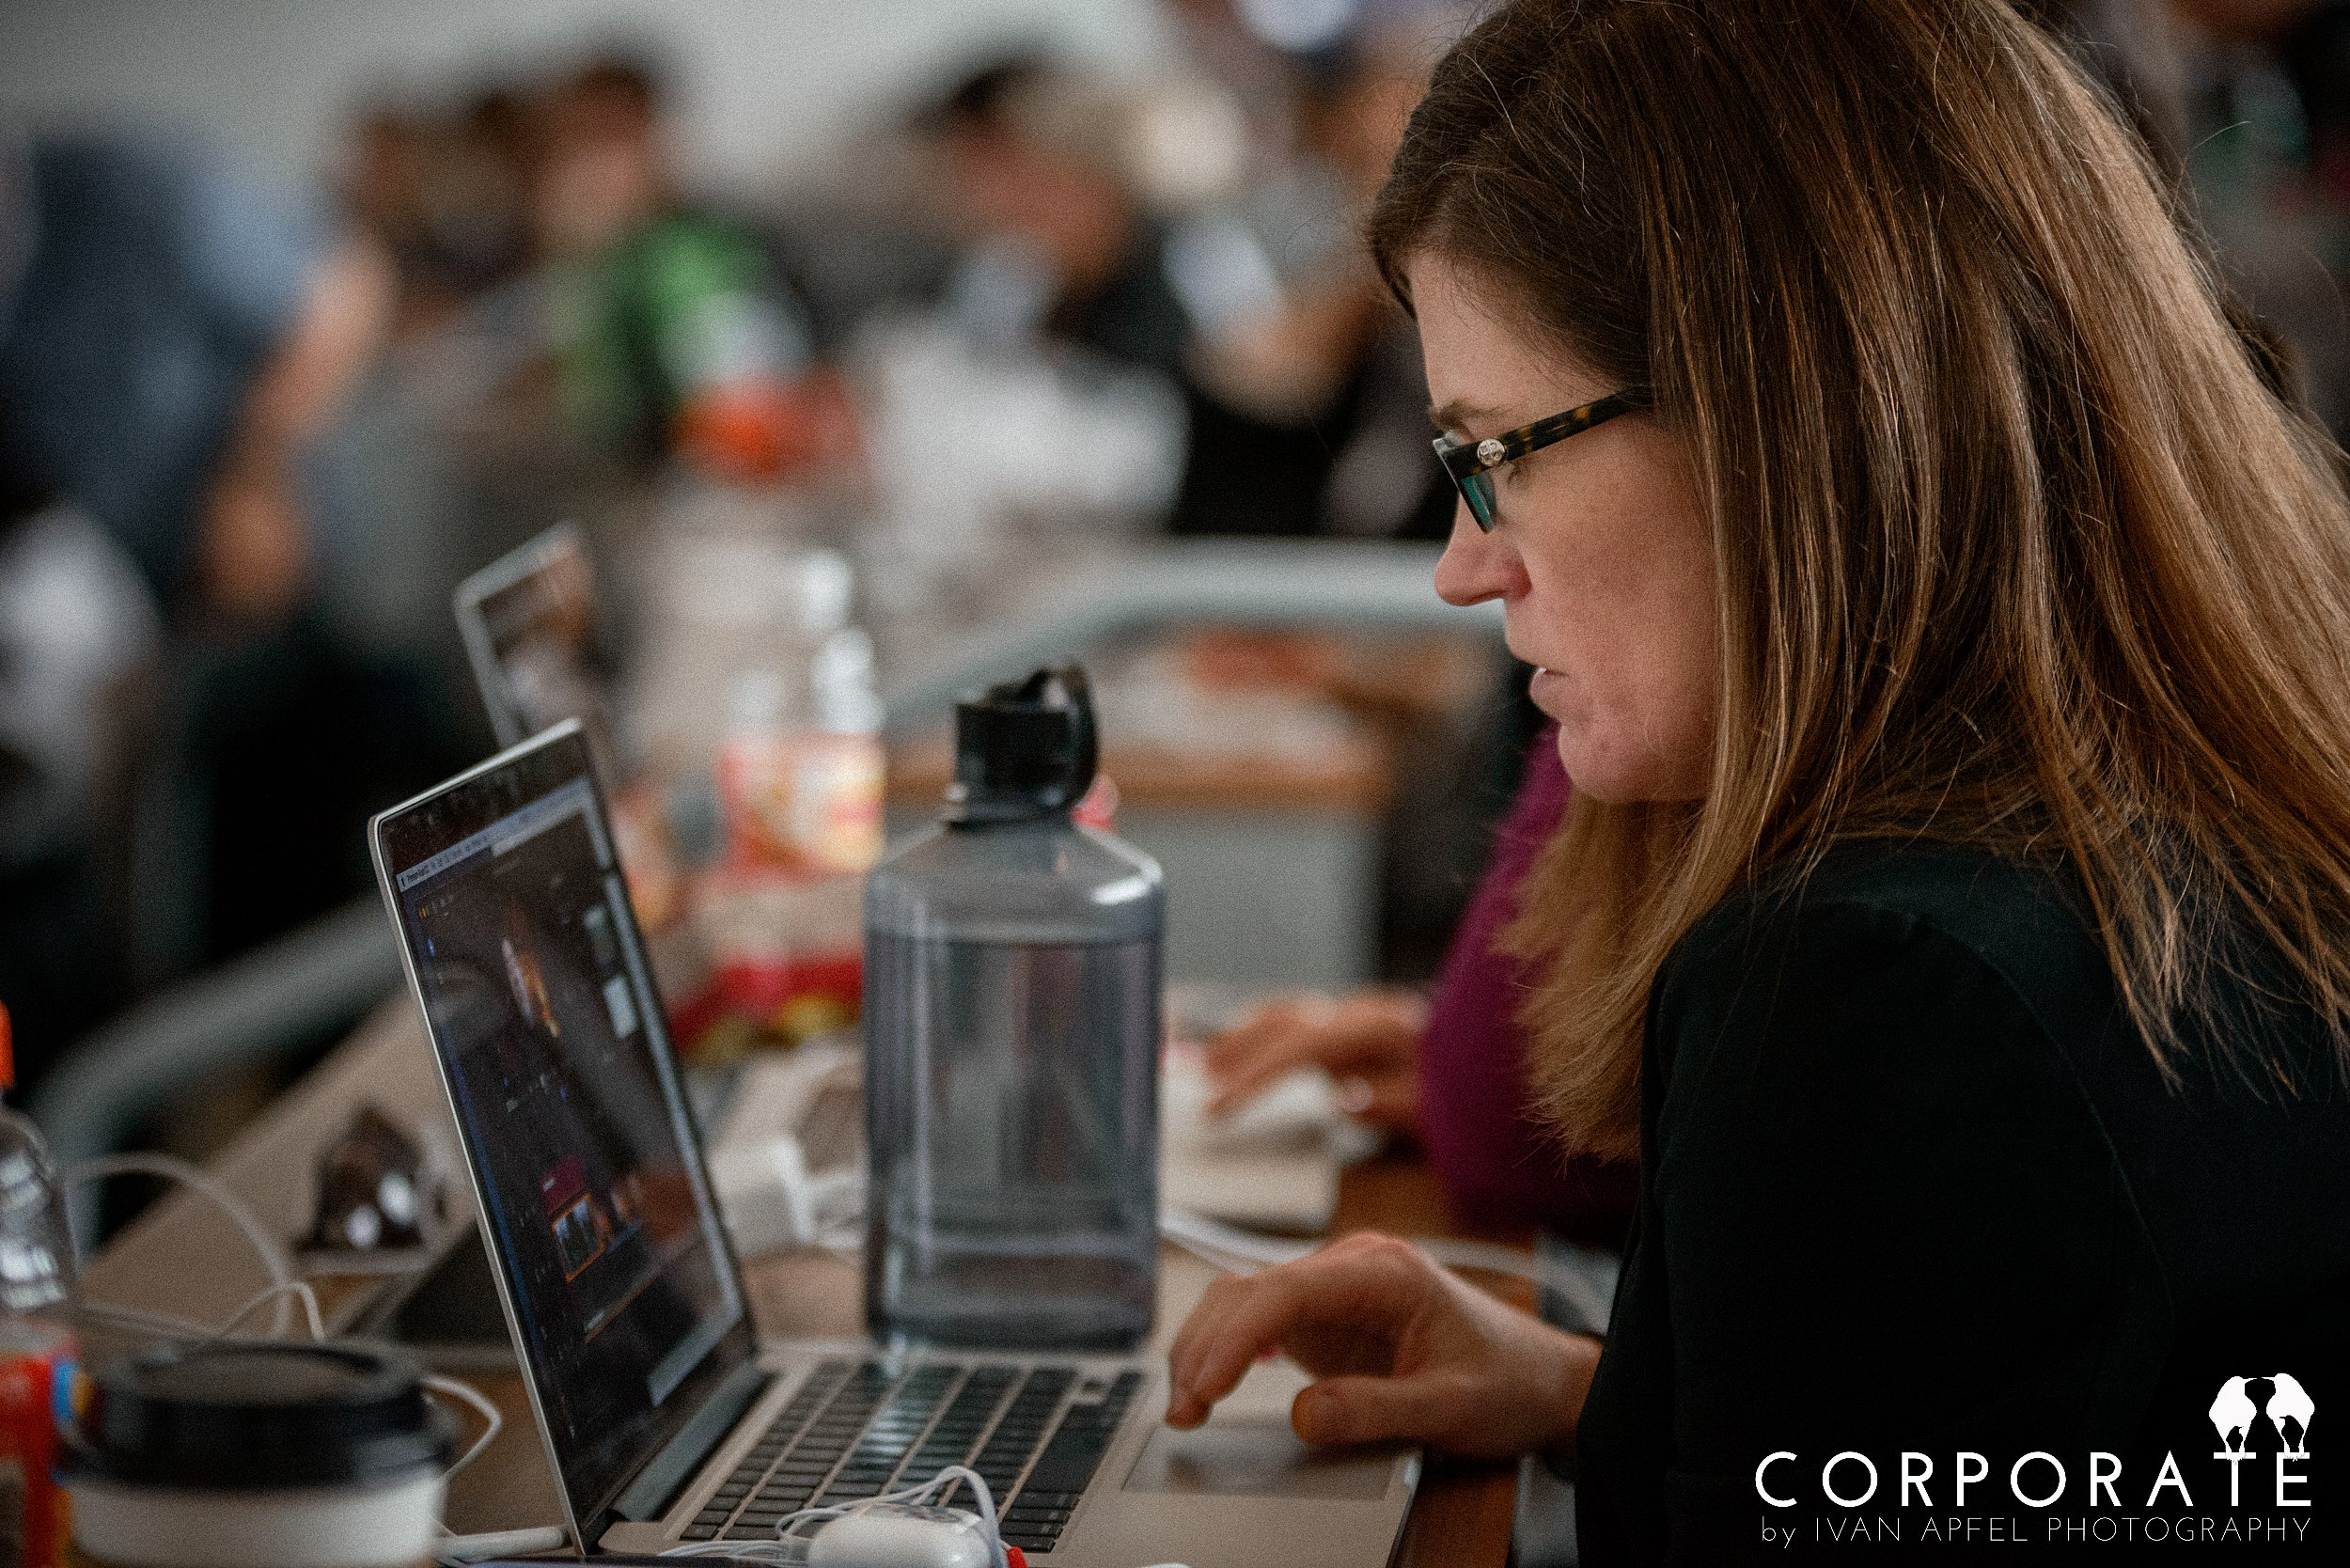 Miami Corporate Event Photographer Adobe Systems Creative Campus 2019-D3_Adobe_Creative_Campus_UMiami-_IAP0672.jpg